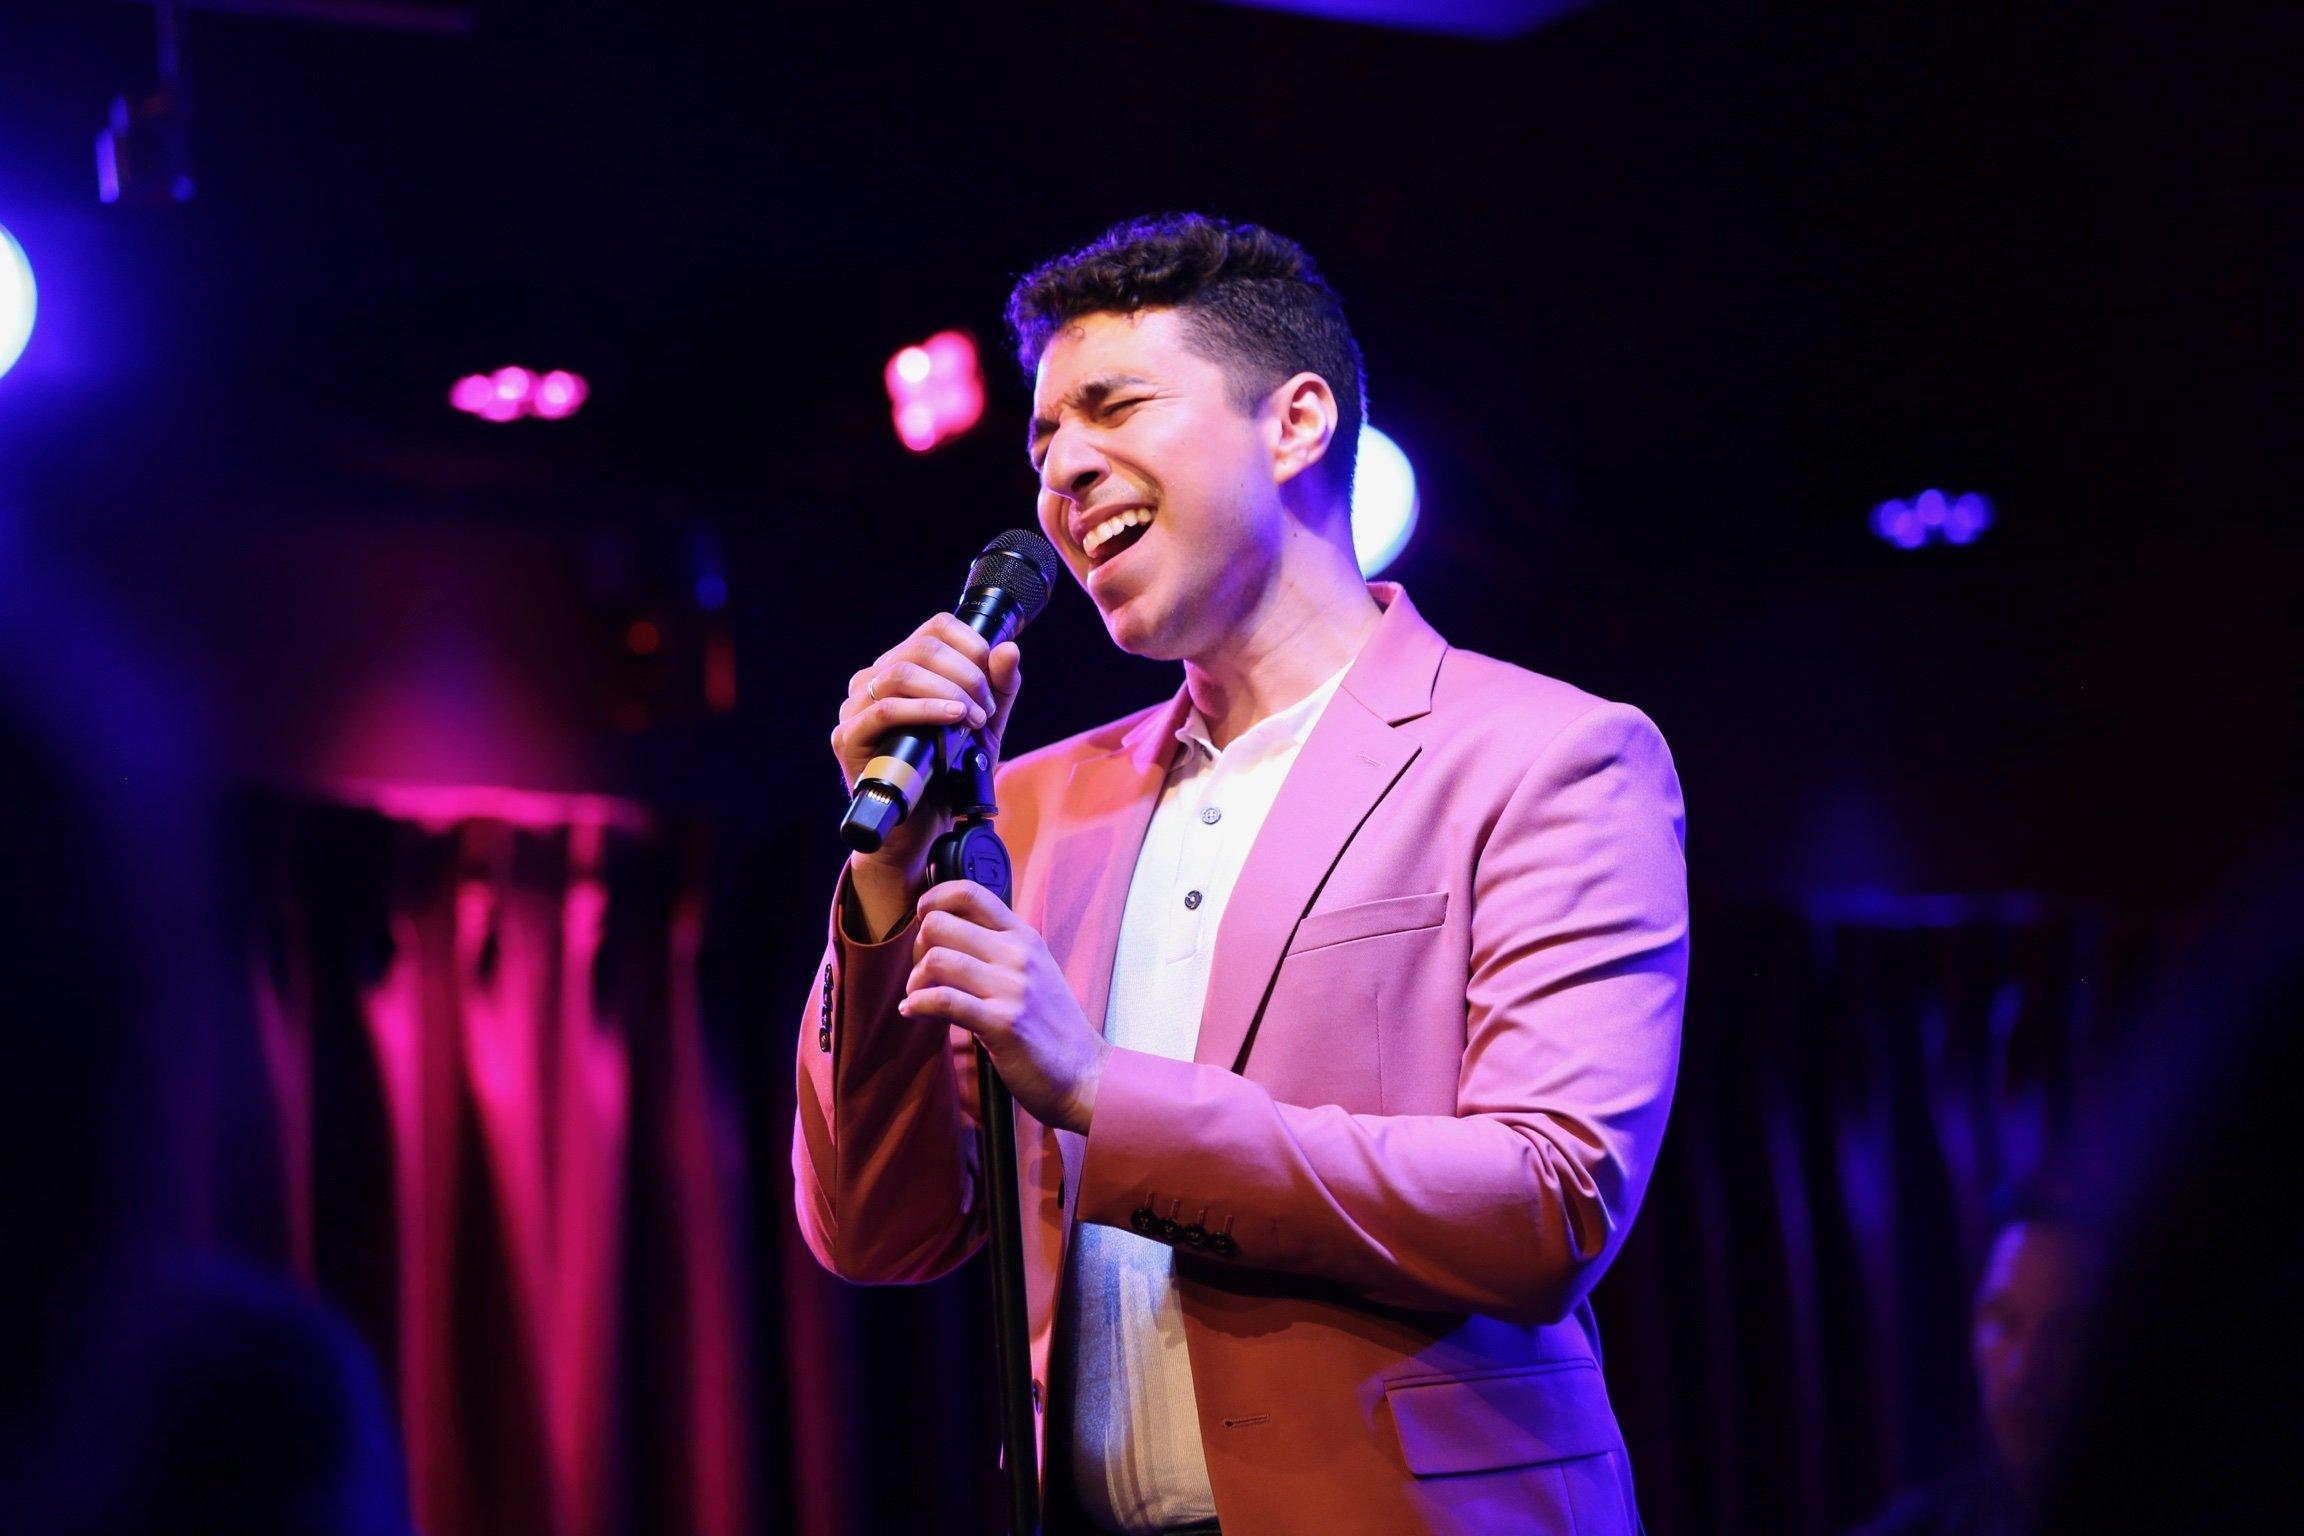 Joey Contreras Concert